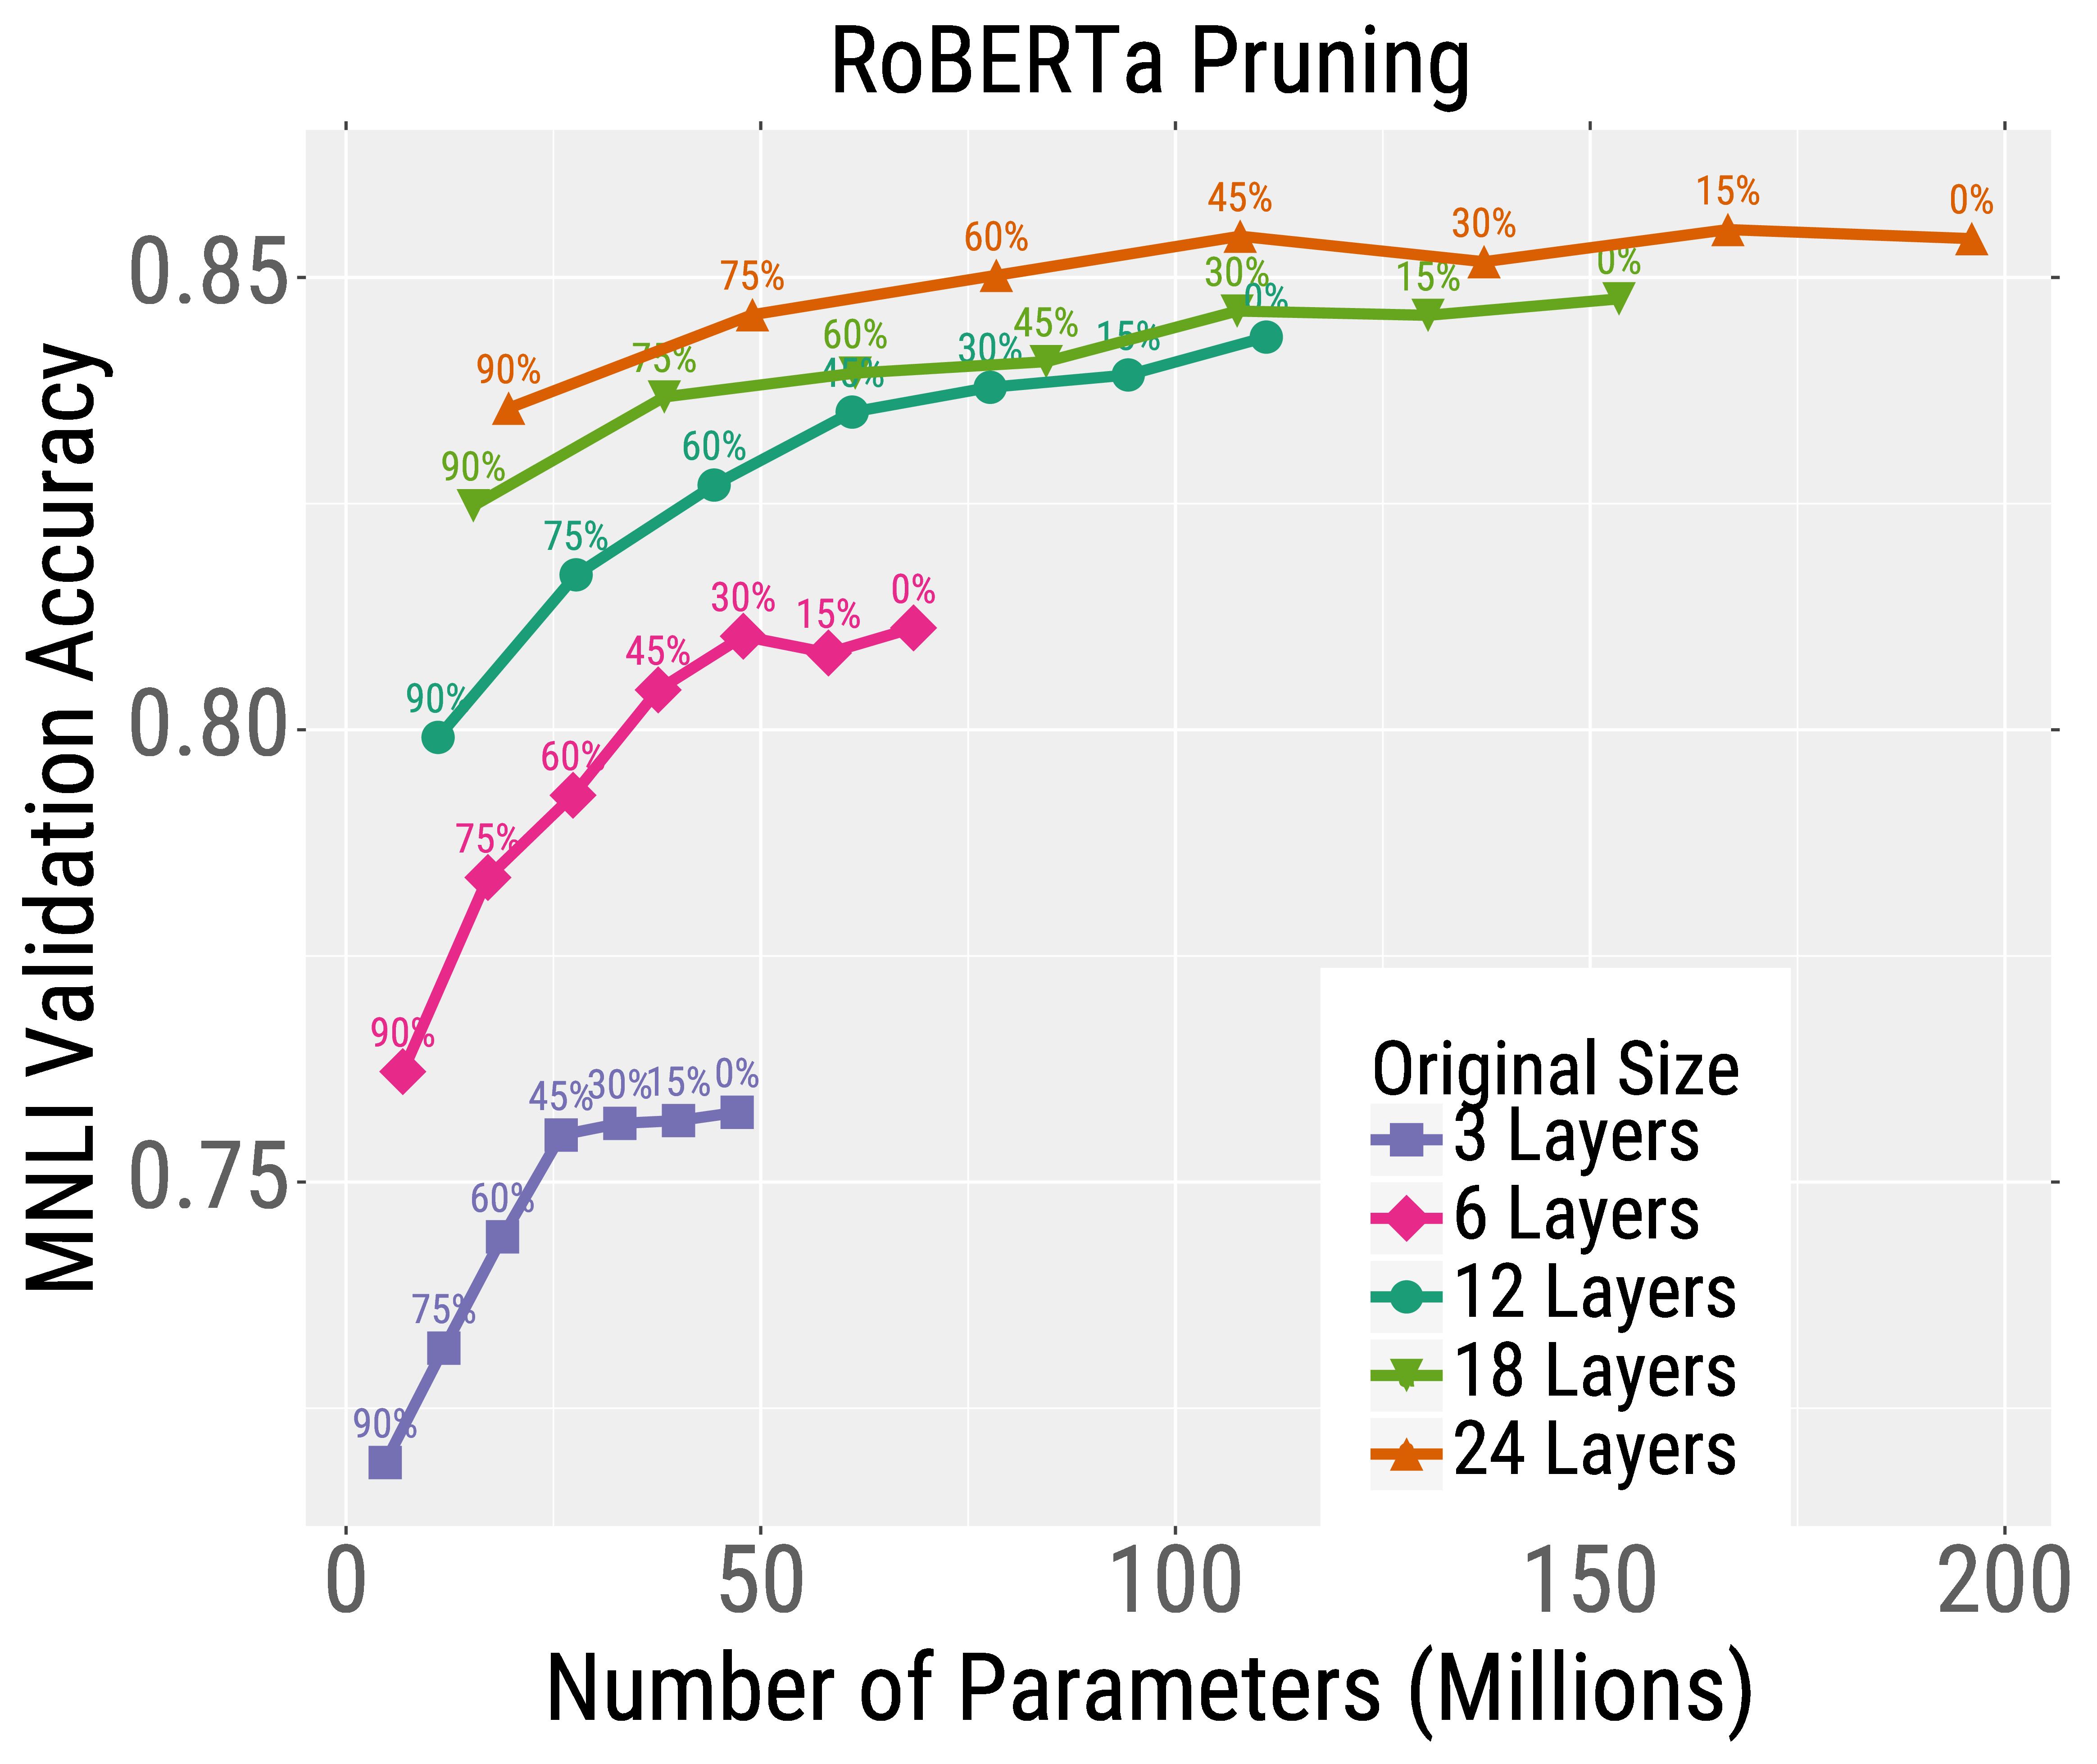 Roberta pruning and quantization